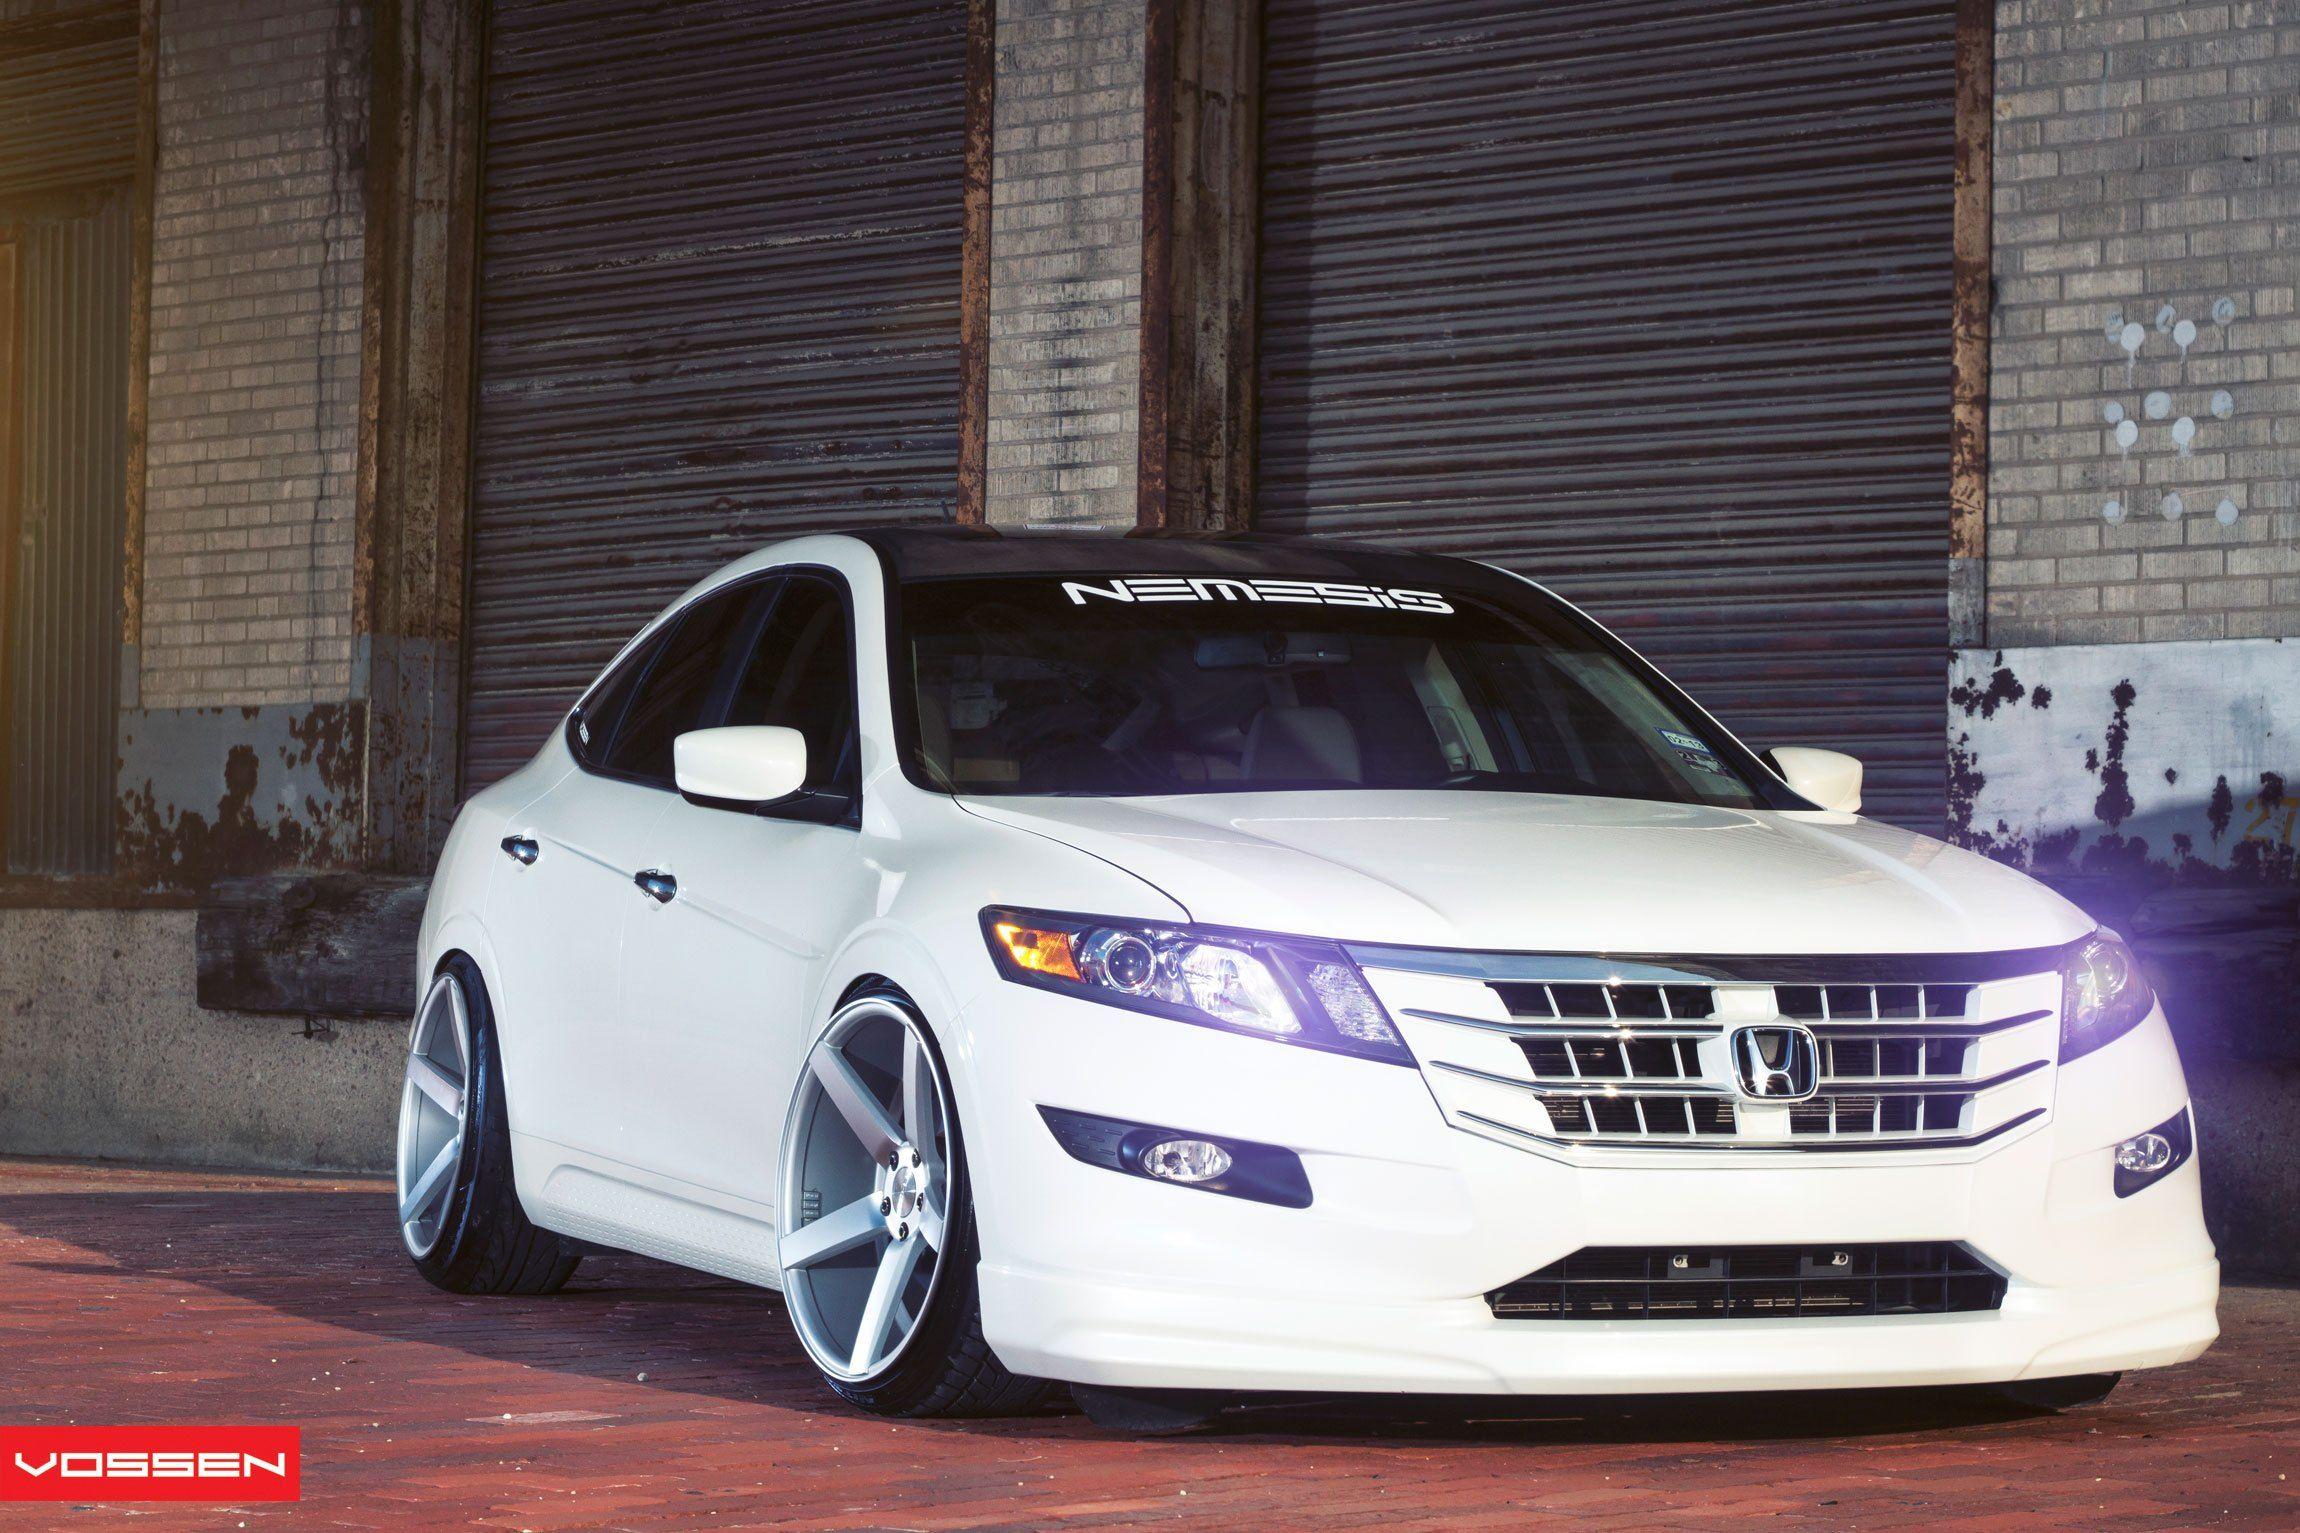 Custom White Honda Boasting Contrasting Black Roof And Vossen Rims Honda Crosstour Honda Accord Honda Accord Custom